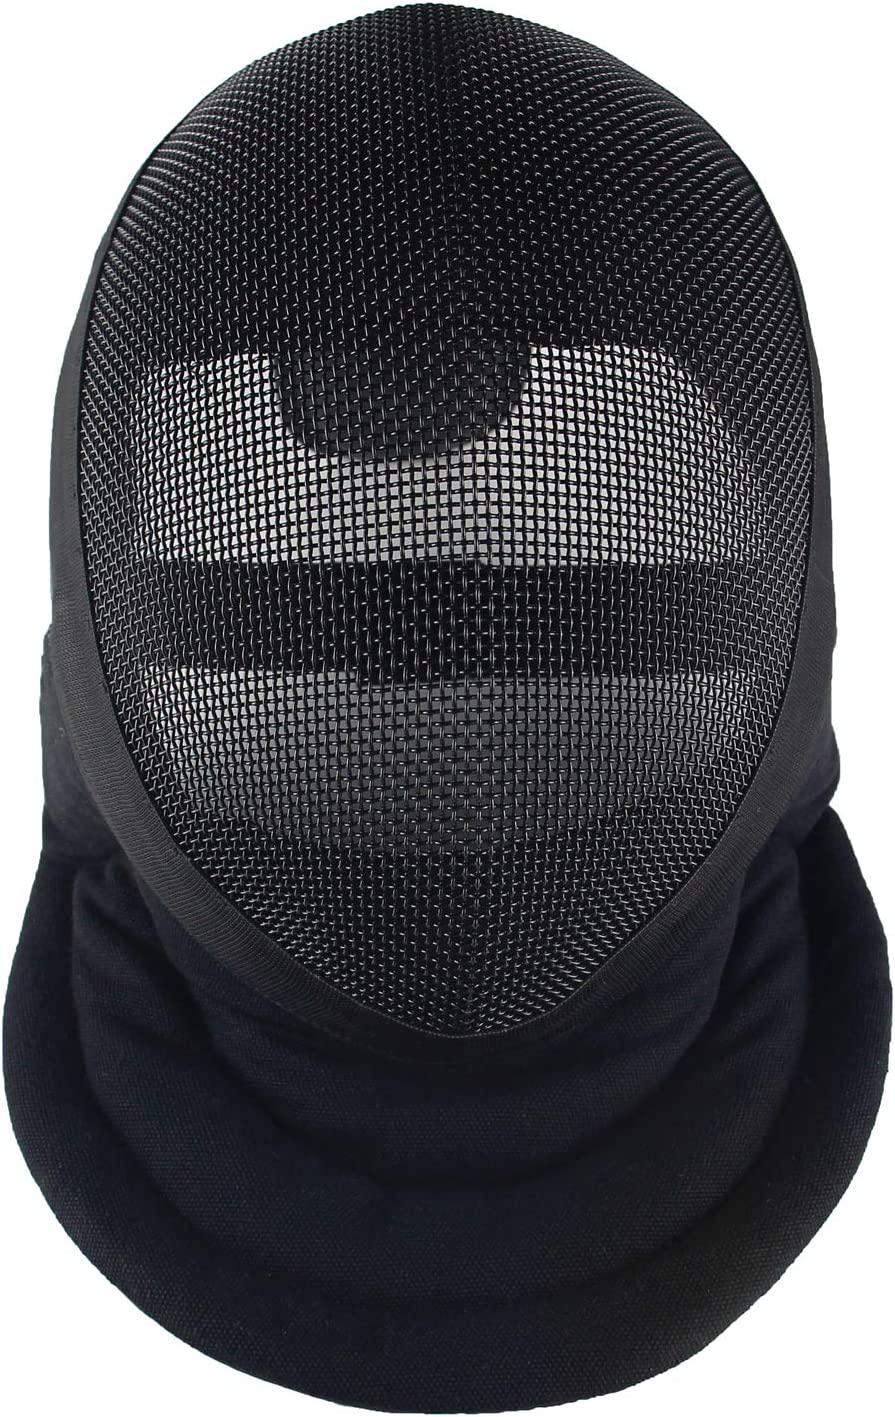 LEONARK Armoury Hema Regular dealer Helmet- Fencing trend rank Coach Mask - Certif CE 350N